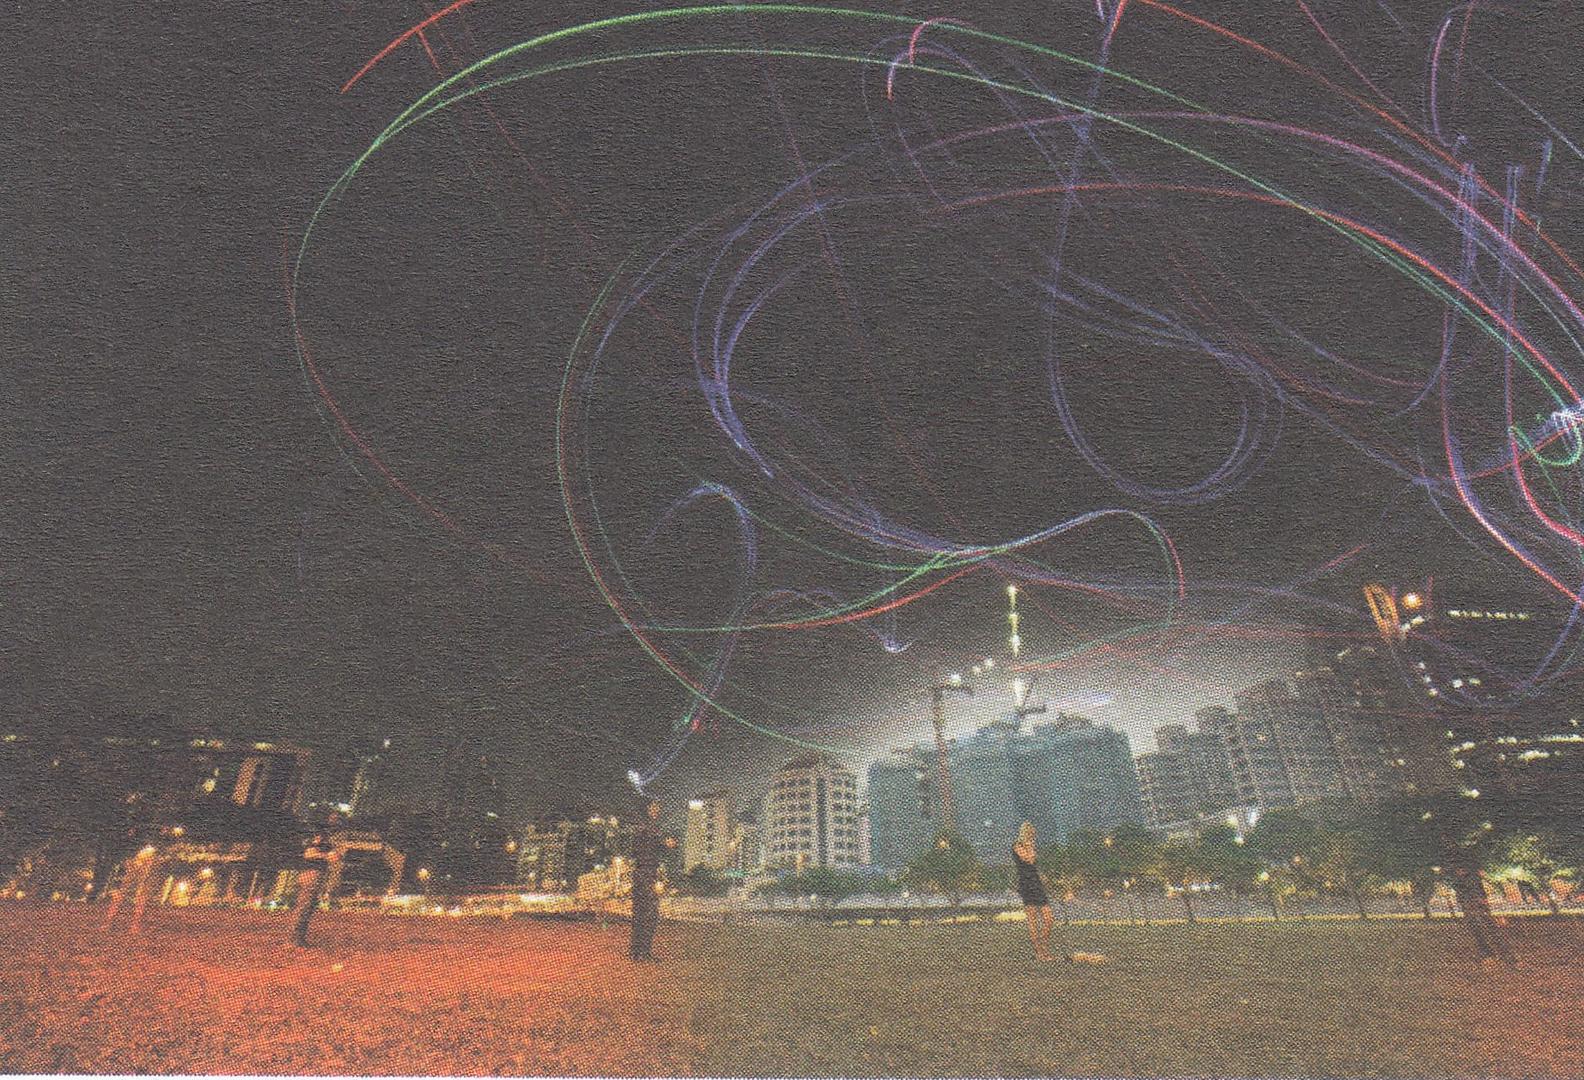 ©, Sam Kang Li, Justin Zhuang, Serene Cheong, and Wong Shu Yu, Multipli-City